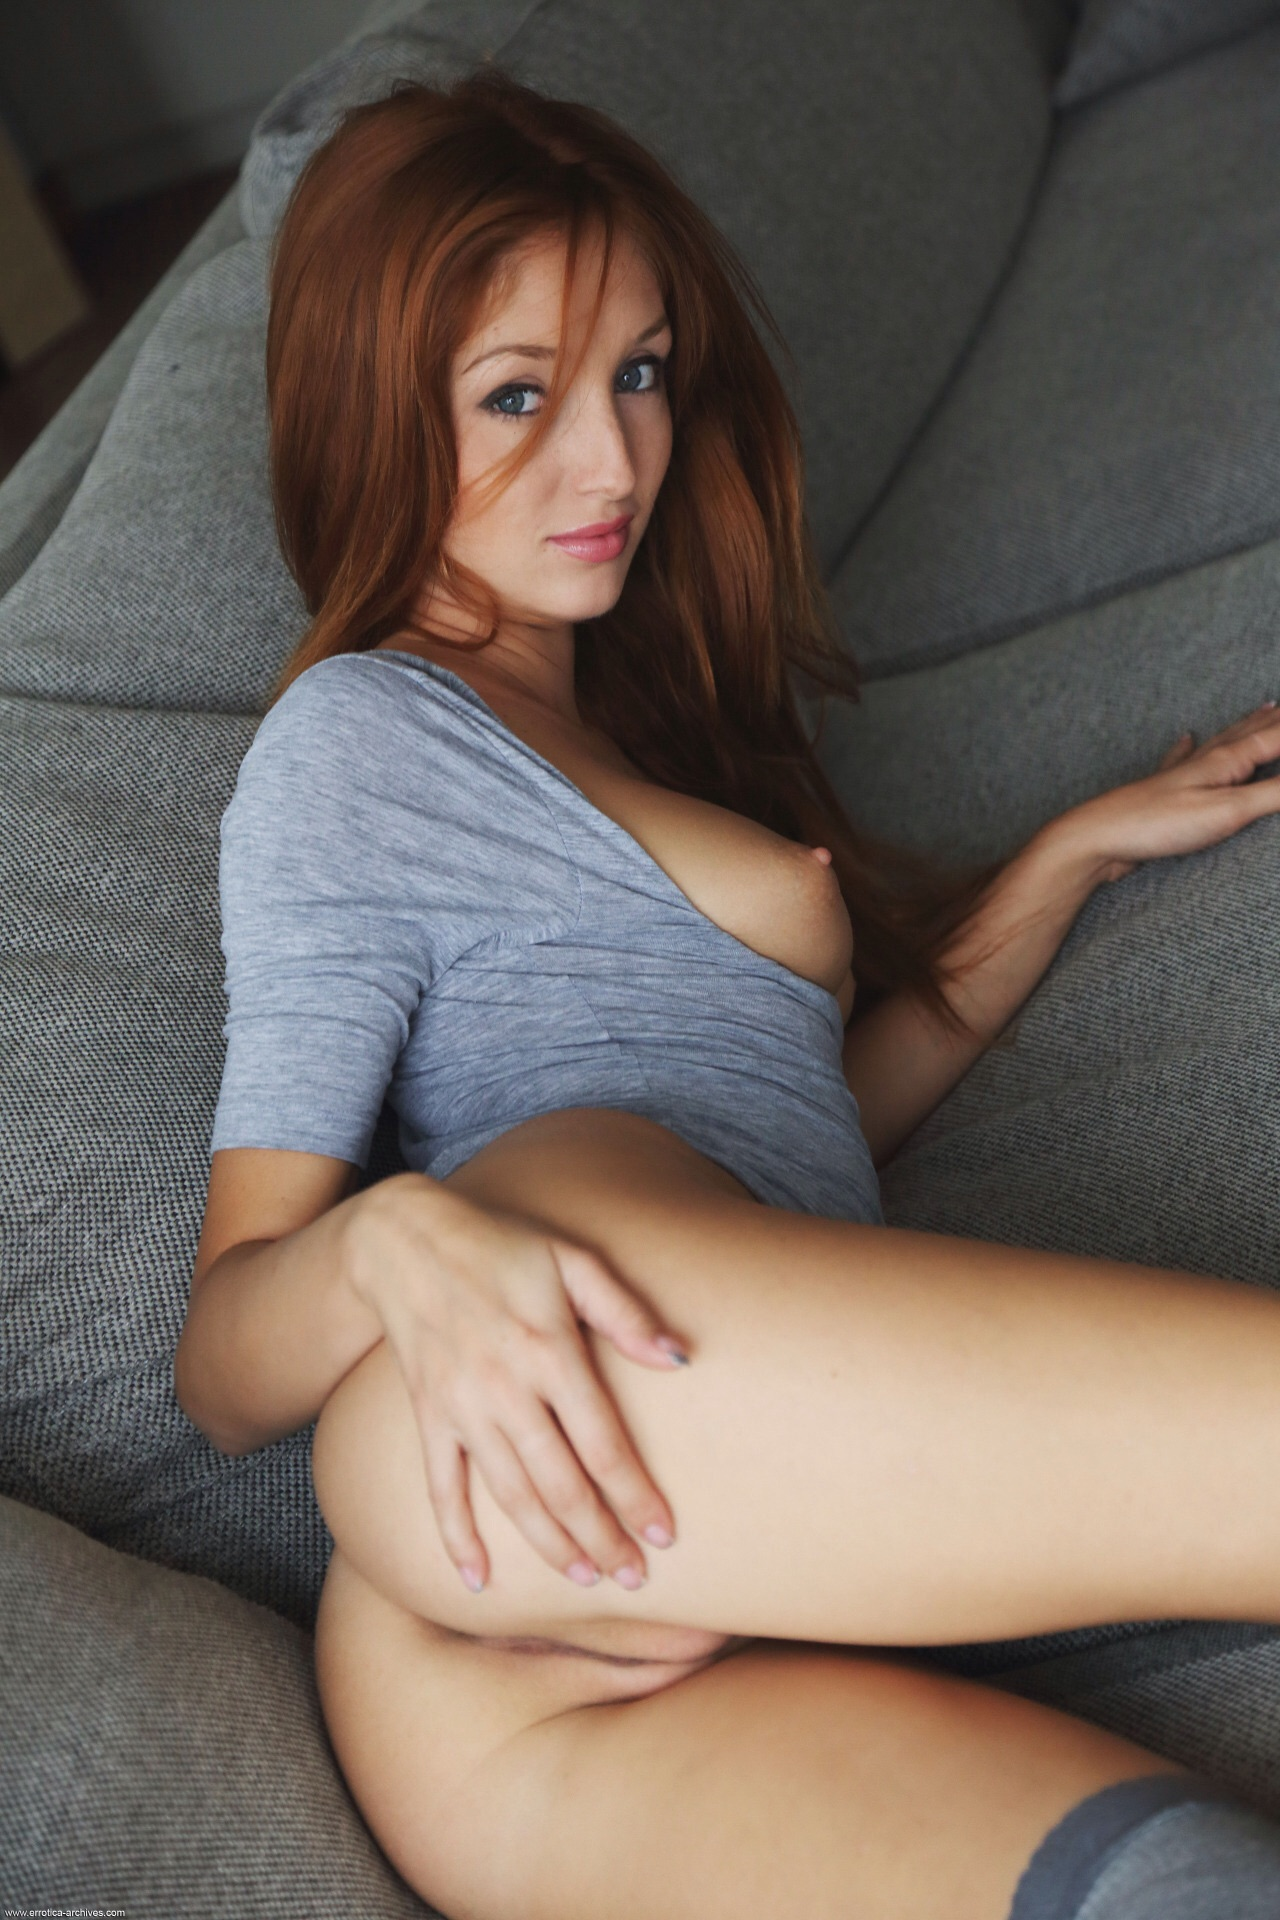 Sexy Redhead Naked